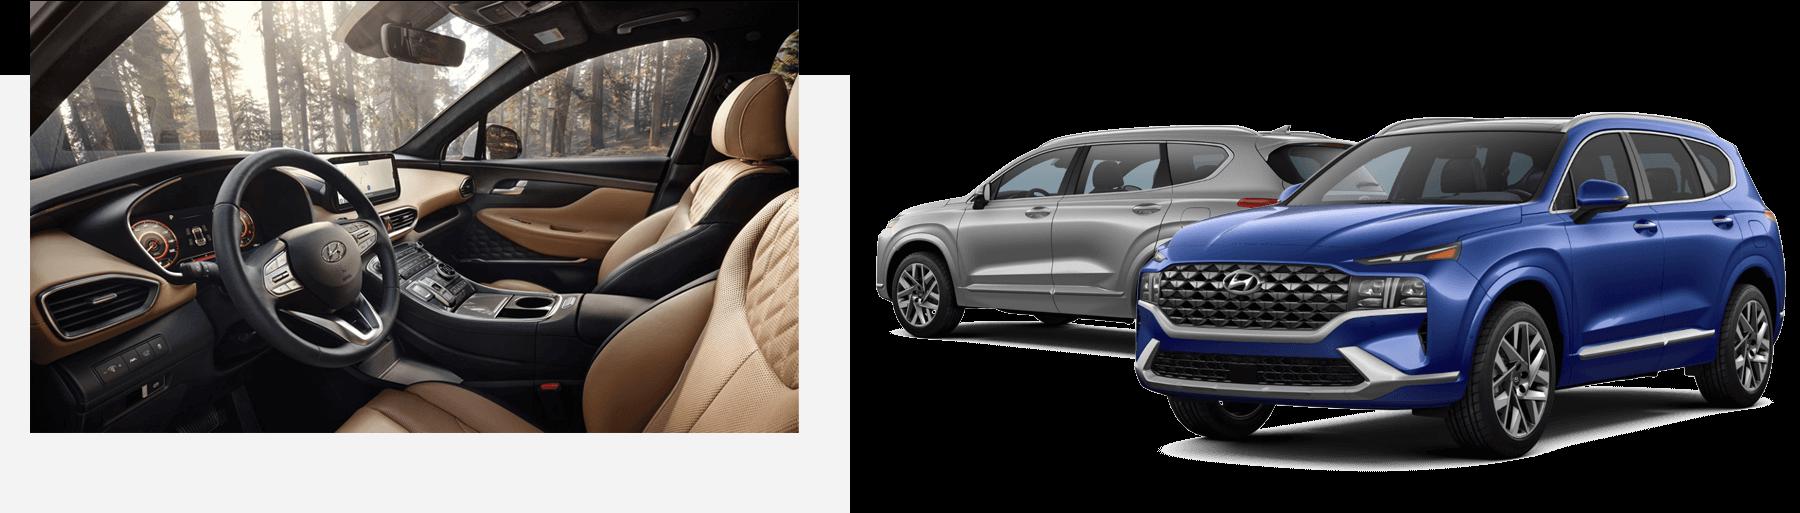 2021 Hyundai Santa Fe Hero Image